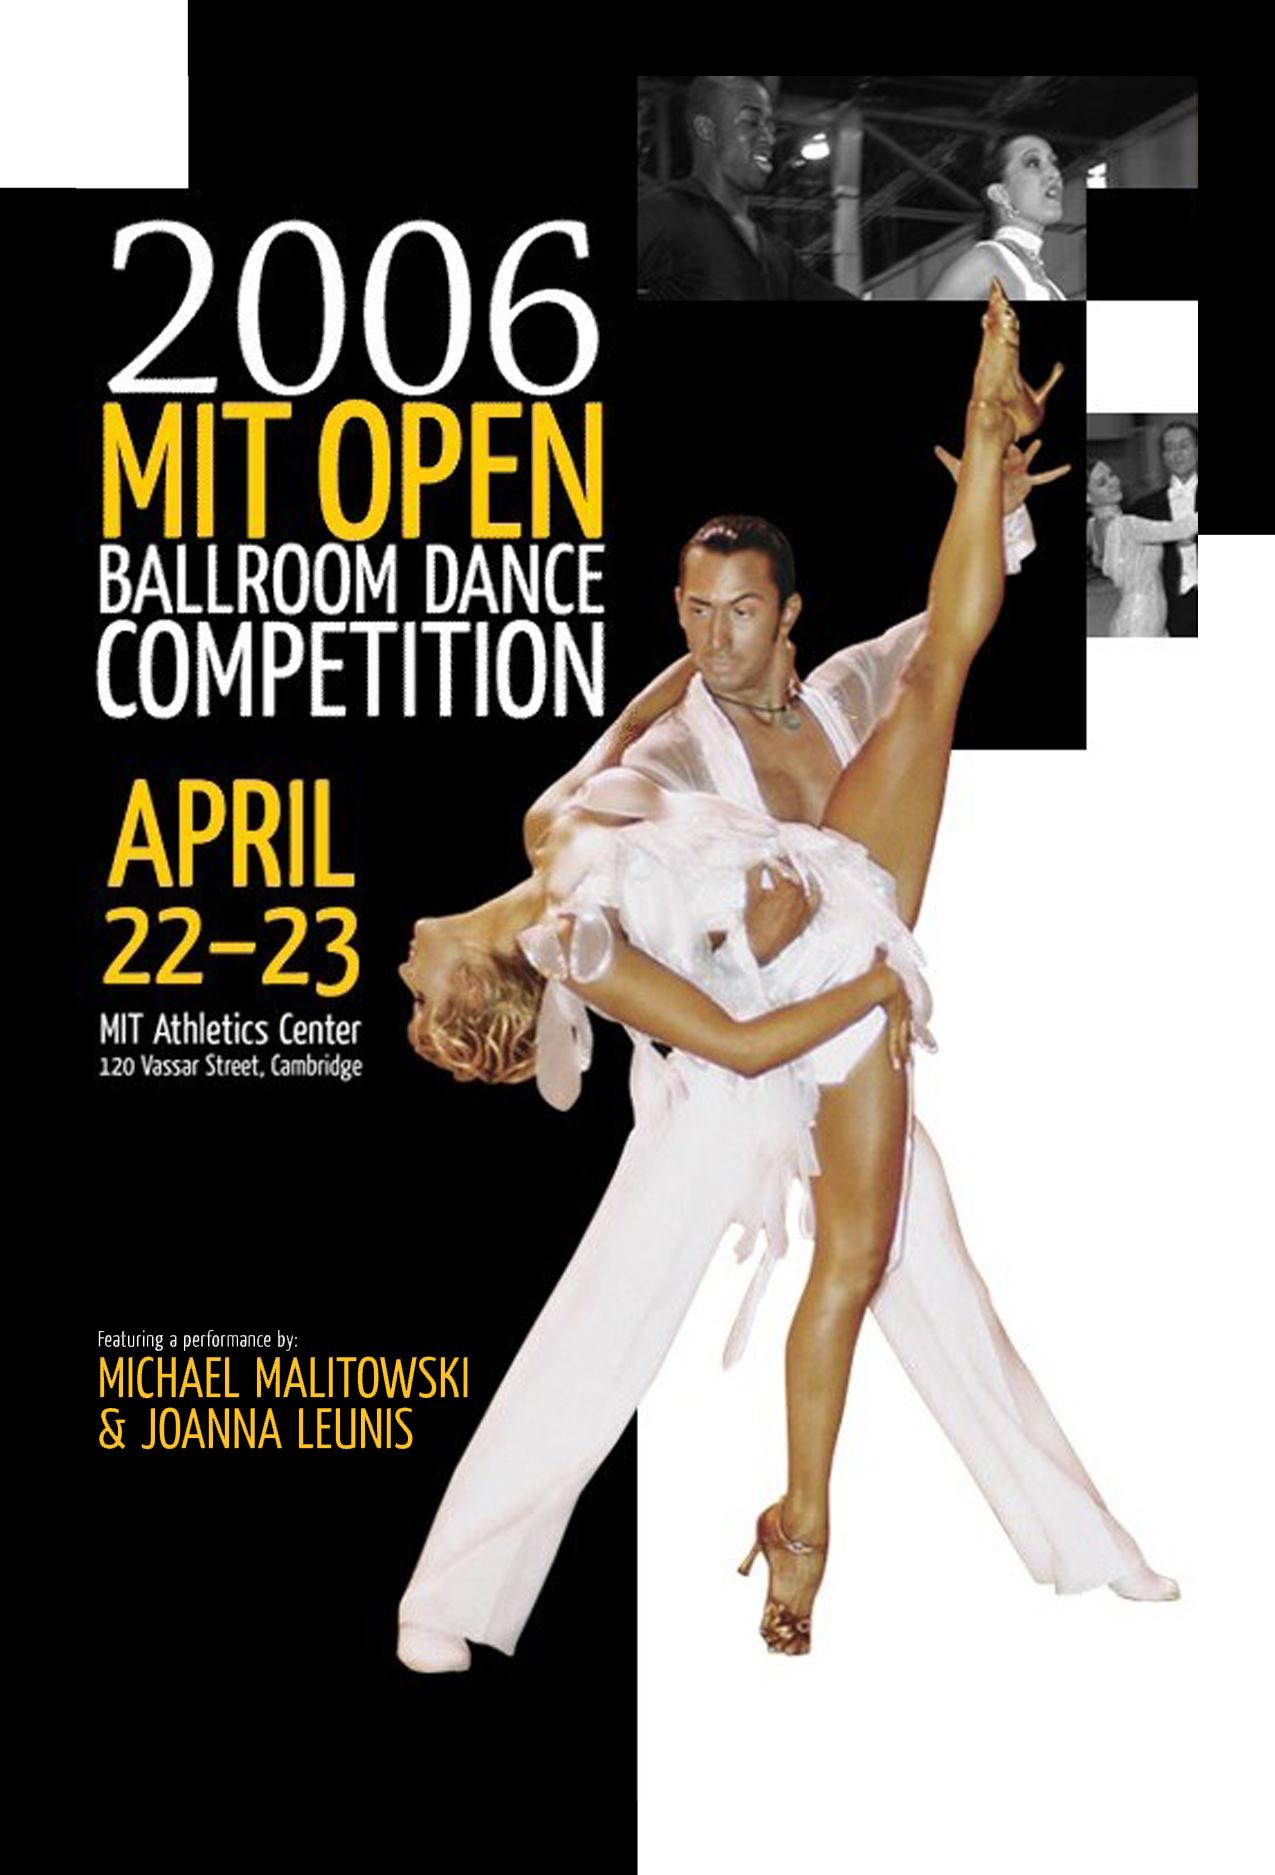 MIT Ballroom Dance Competition 2006